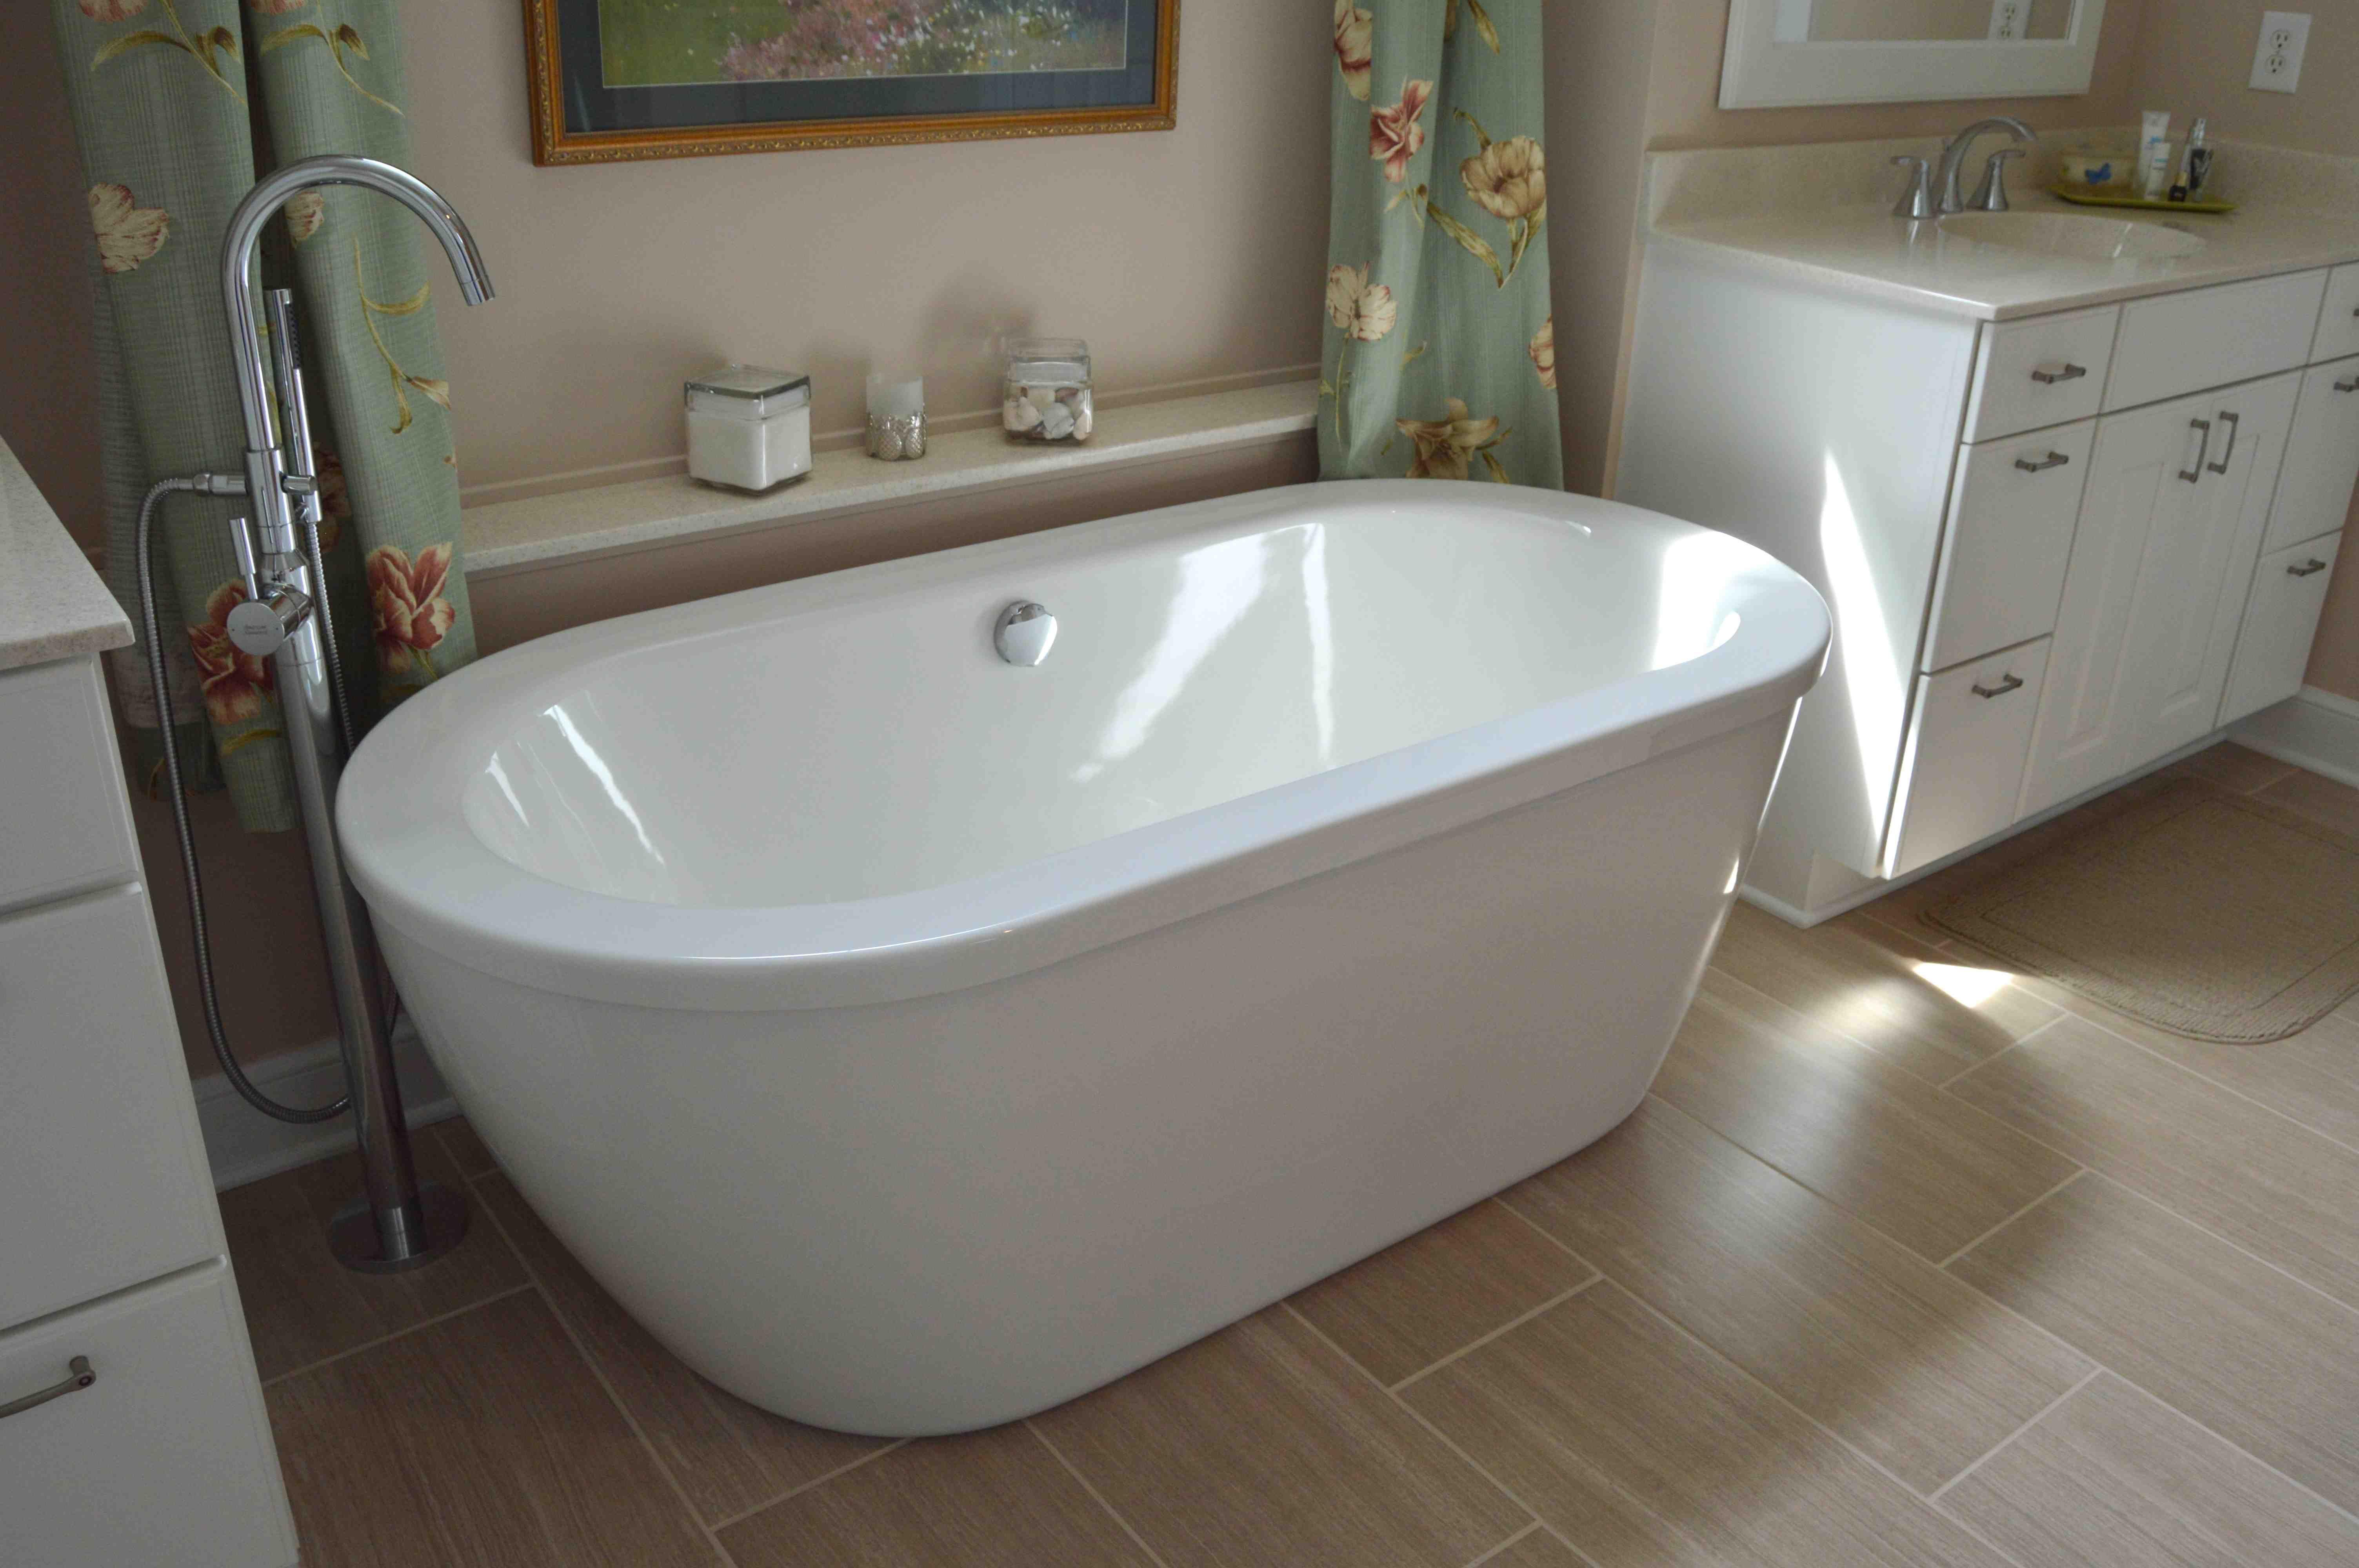 NgoBathroomRemodelTubShowerHatchettDesignRenovateVirginia - Hatchett bathroom remodel